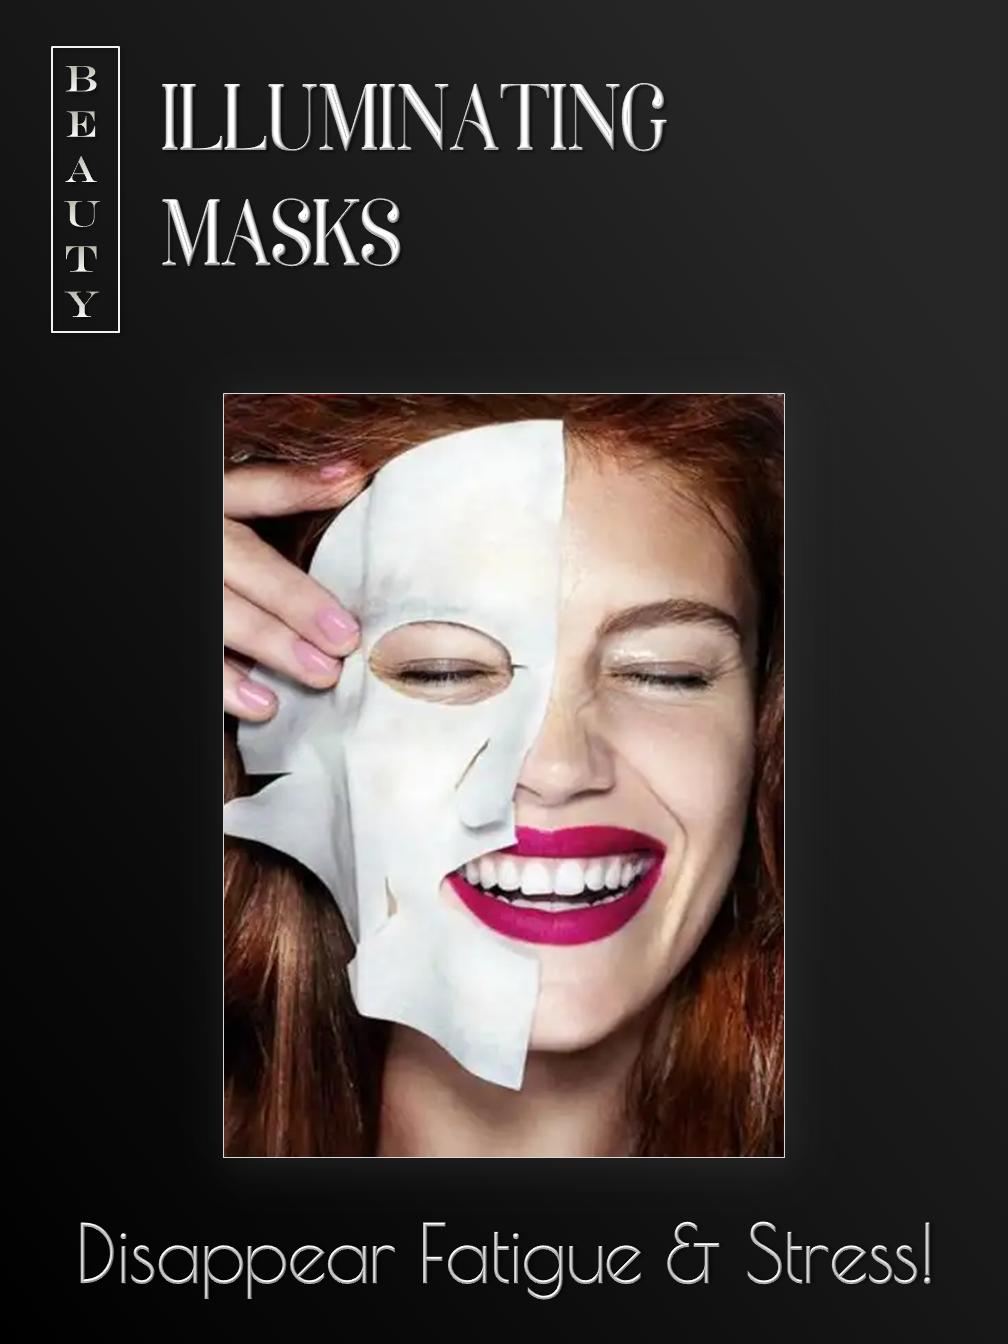 Illuminating Masks